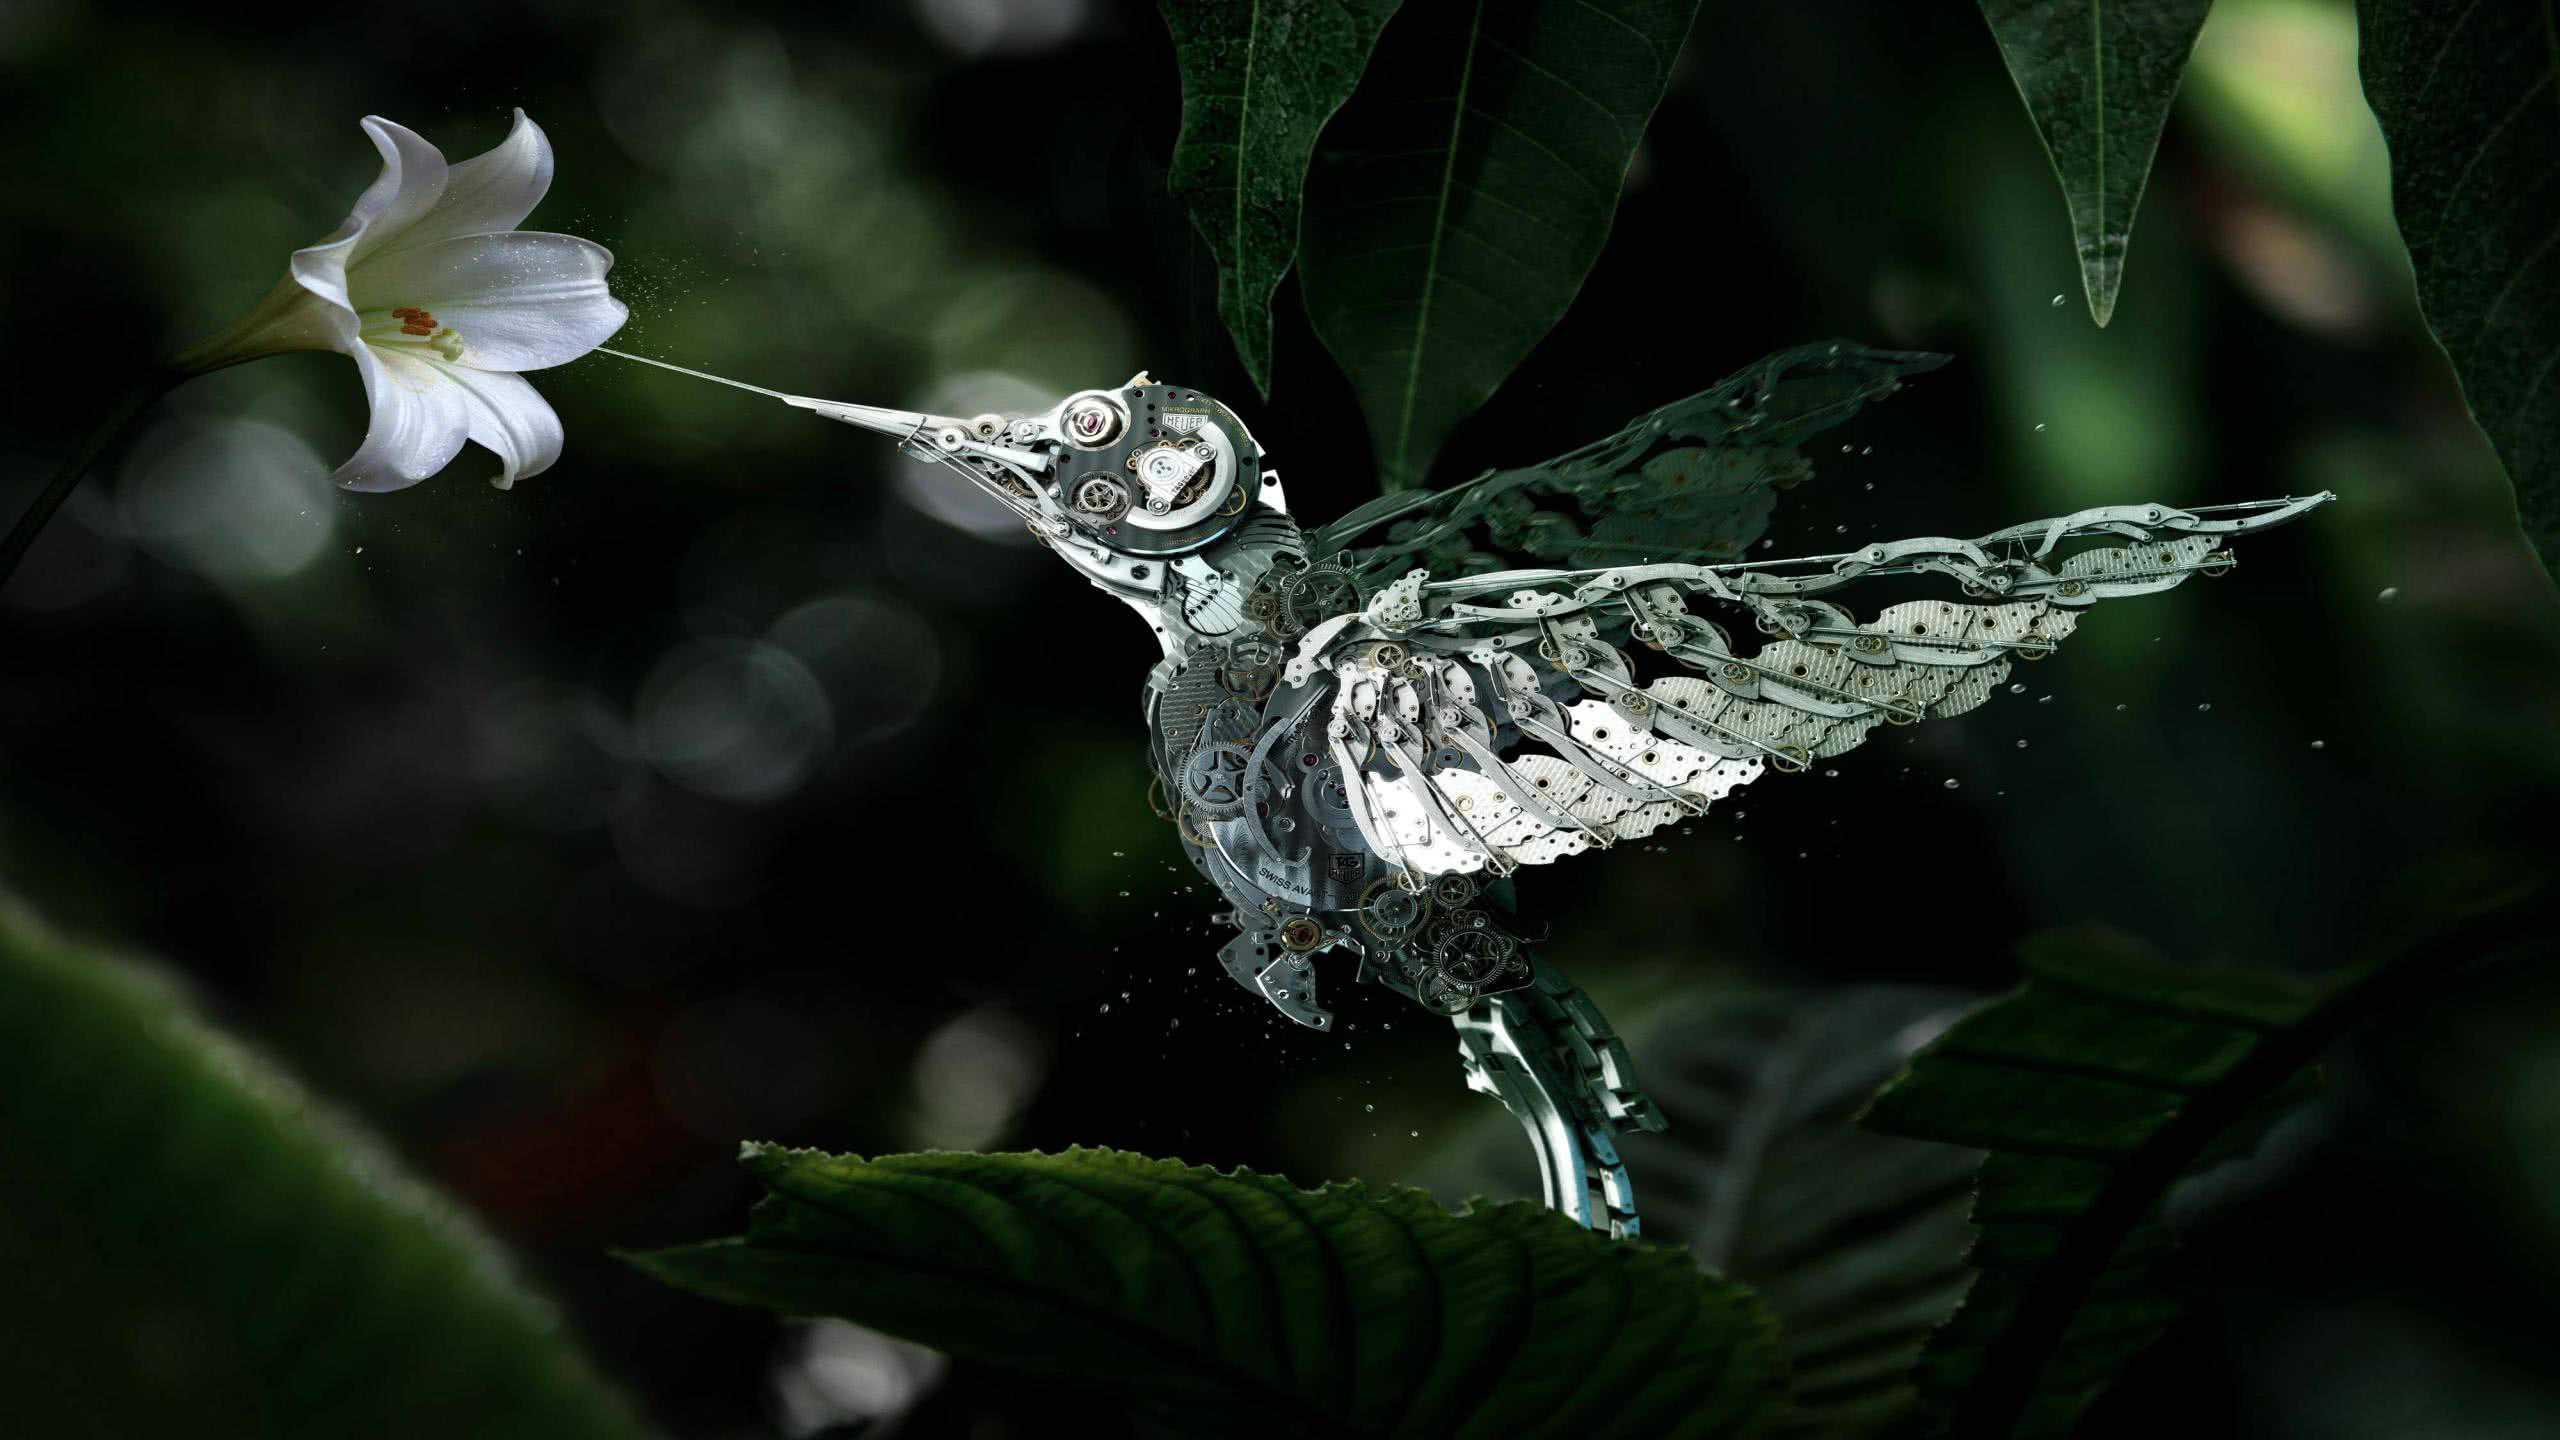 mechanical hummingbird wqhd 1440p wallpaper